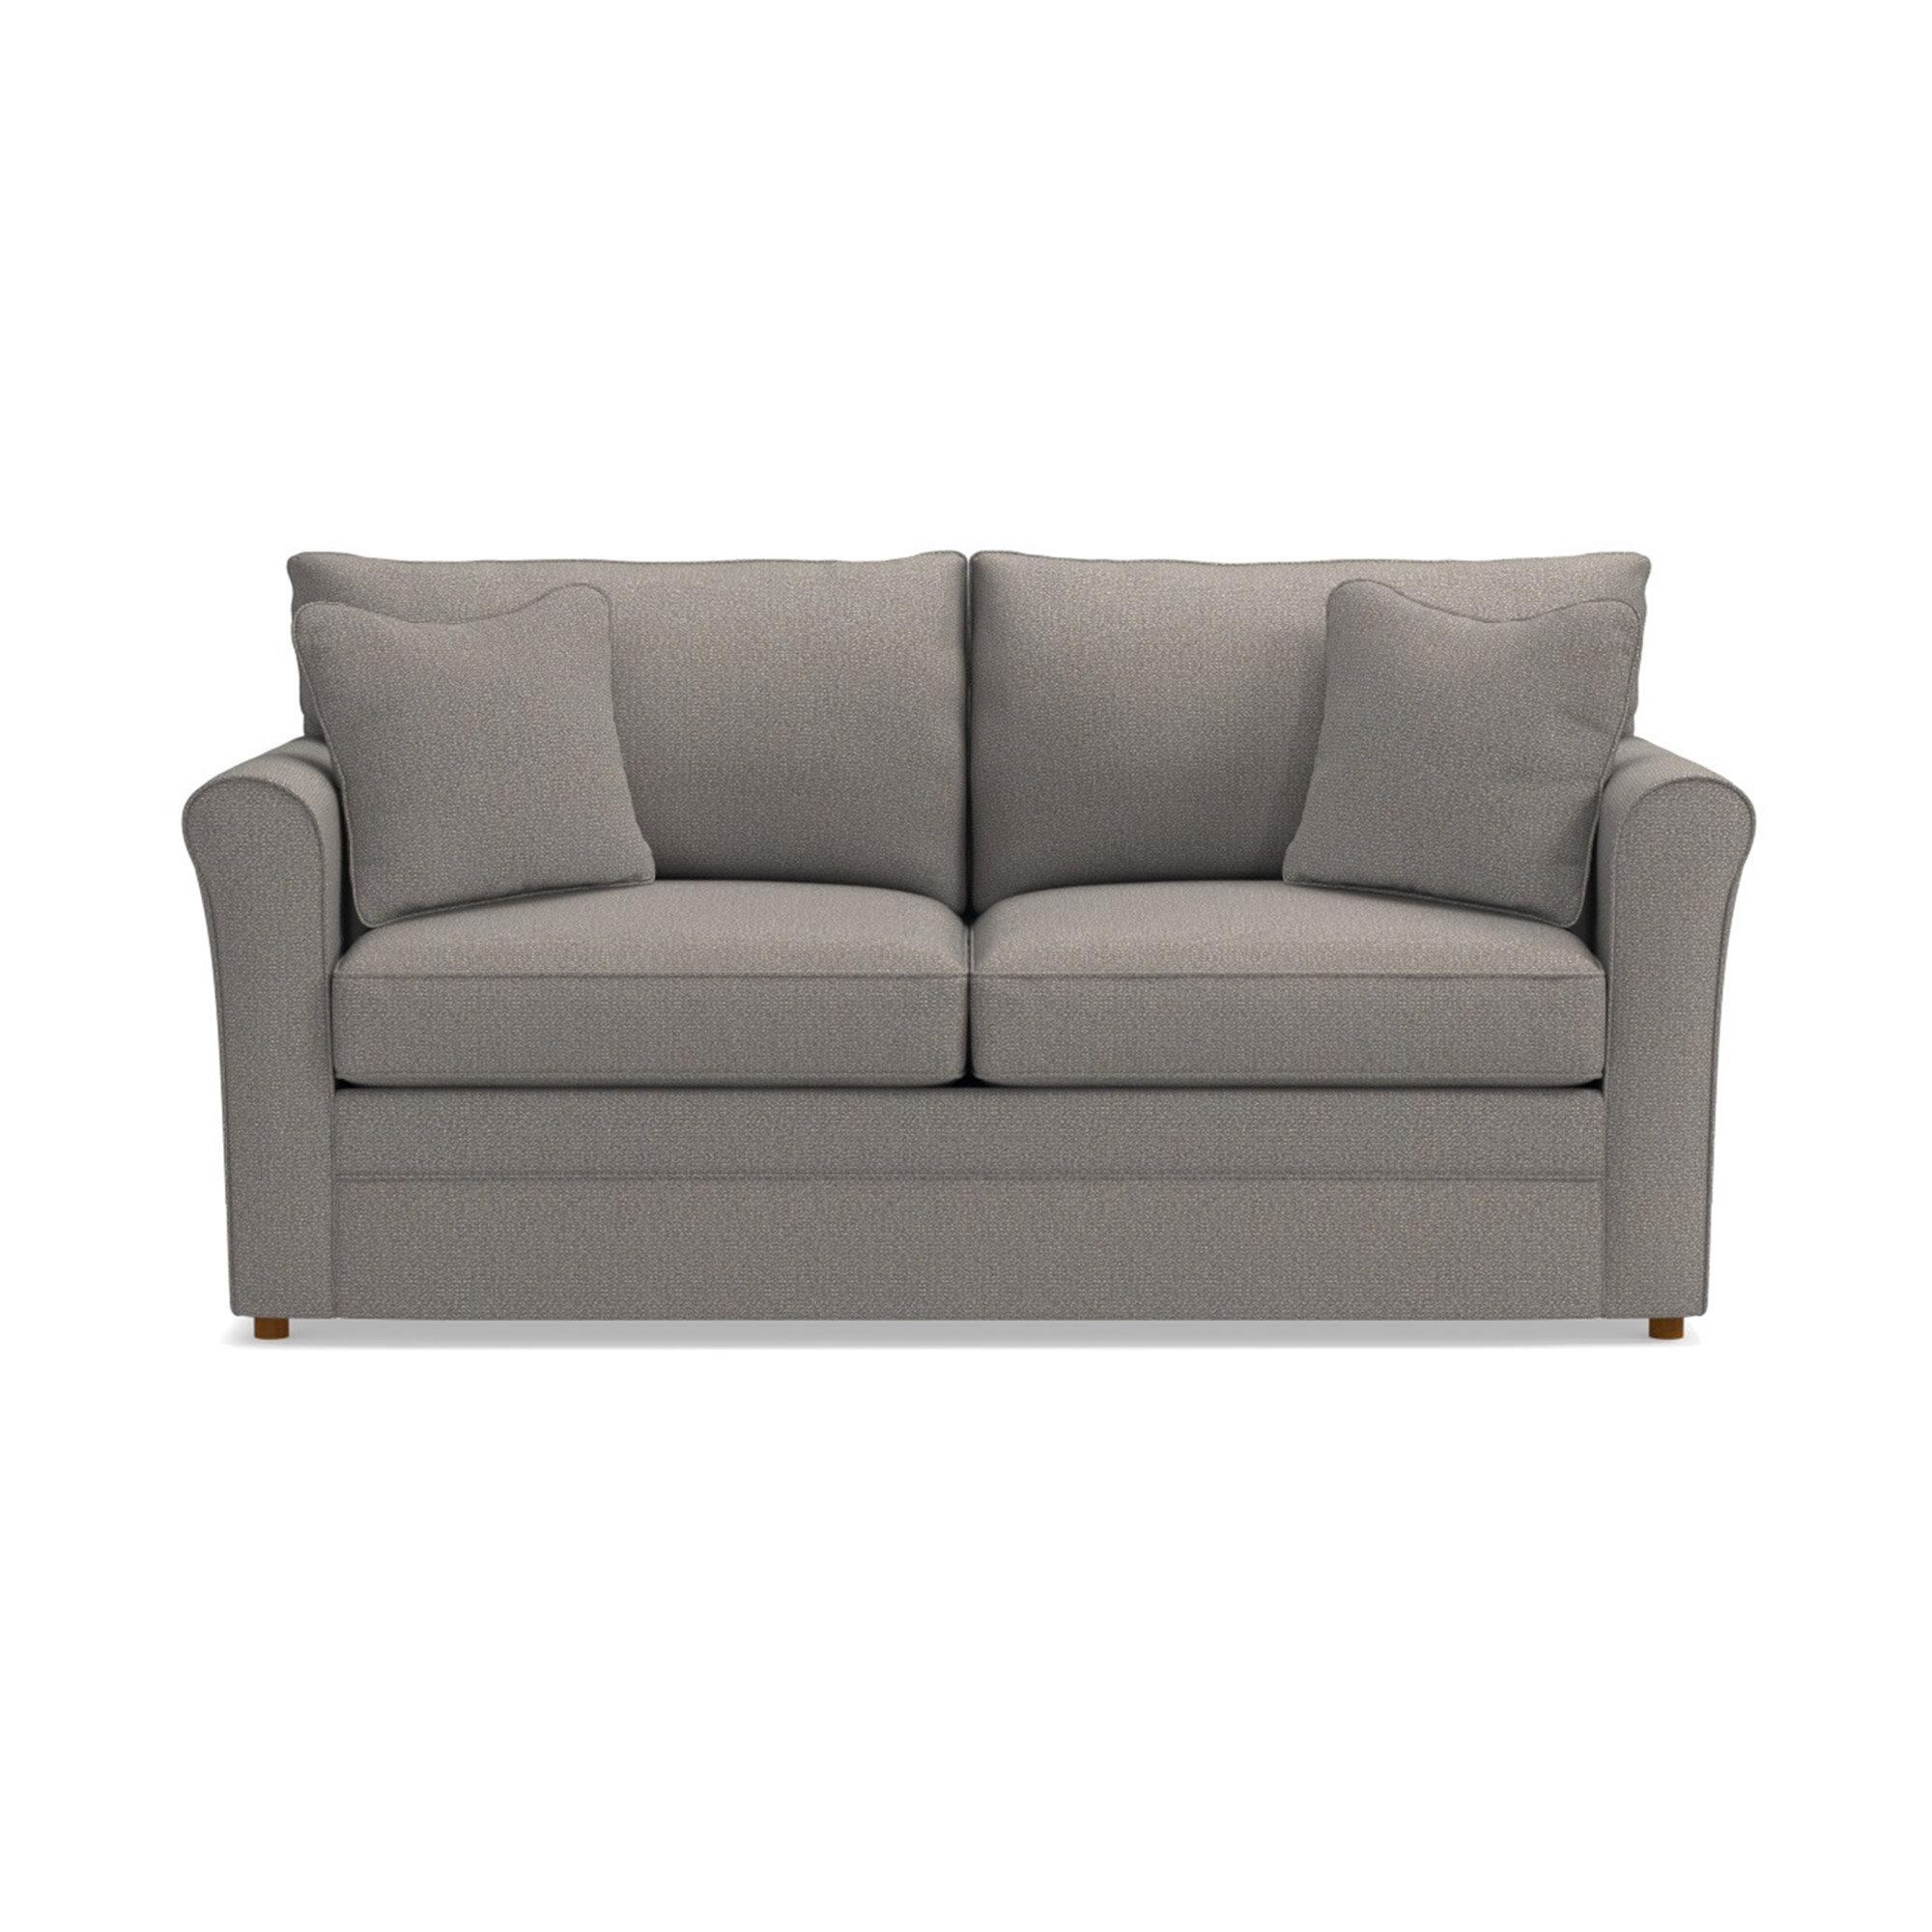 Picture of: La Z Boy Leah 74 Rolled Arm Sofa Bed Reviews